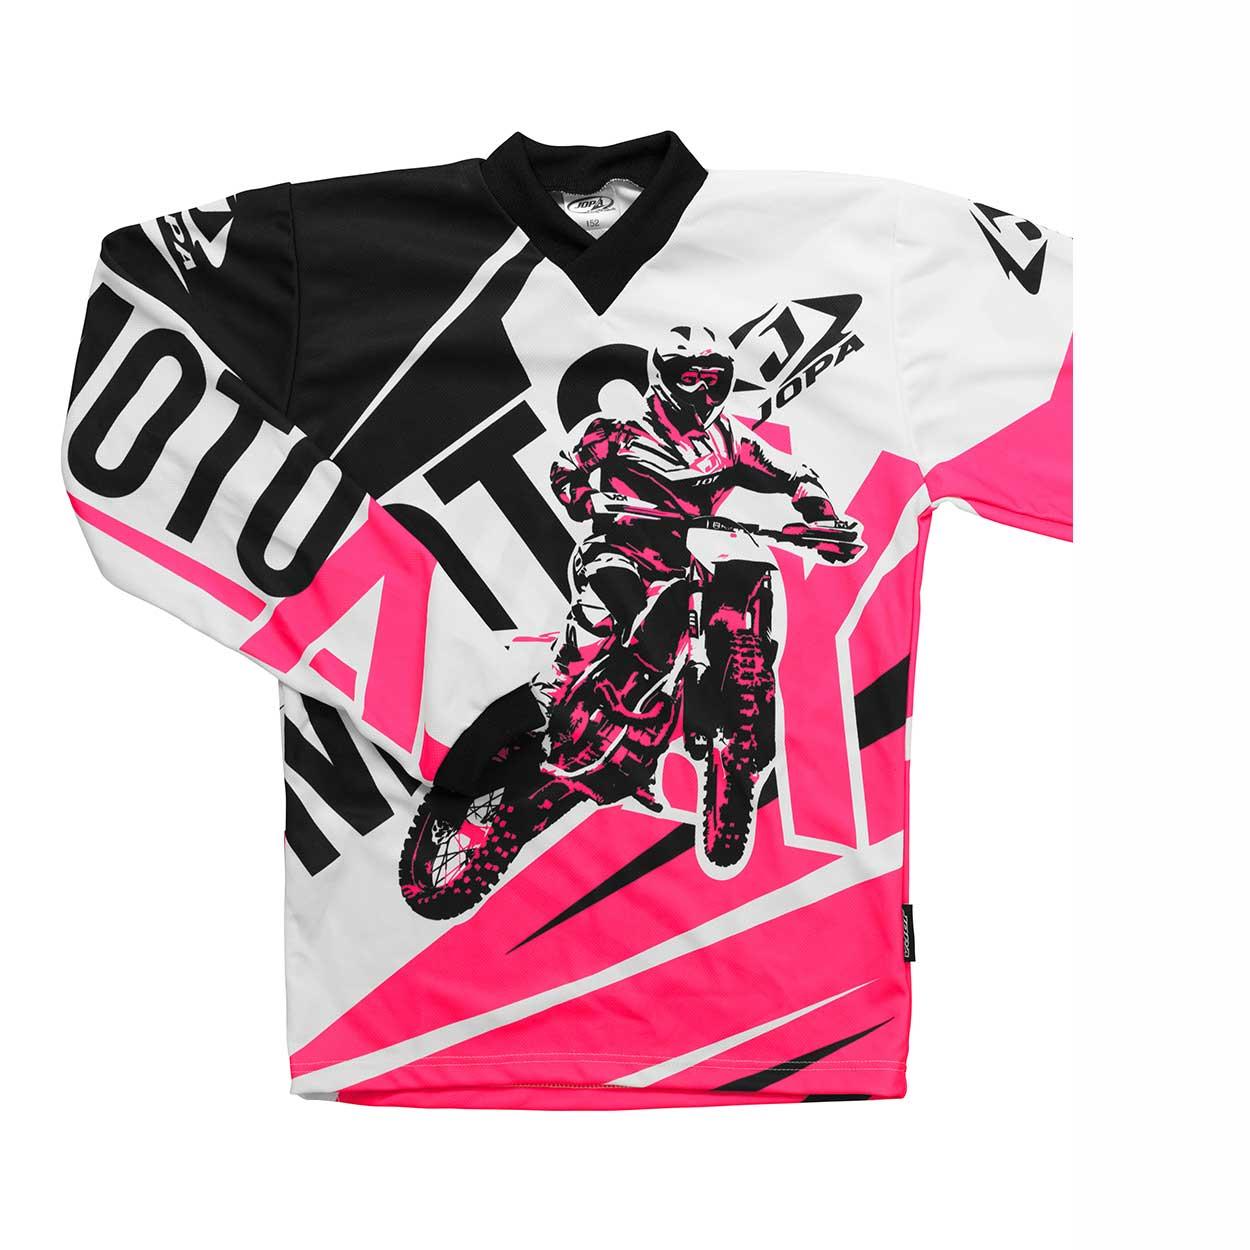 Jopa Kinder Shirt Moto-X Pink-74